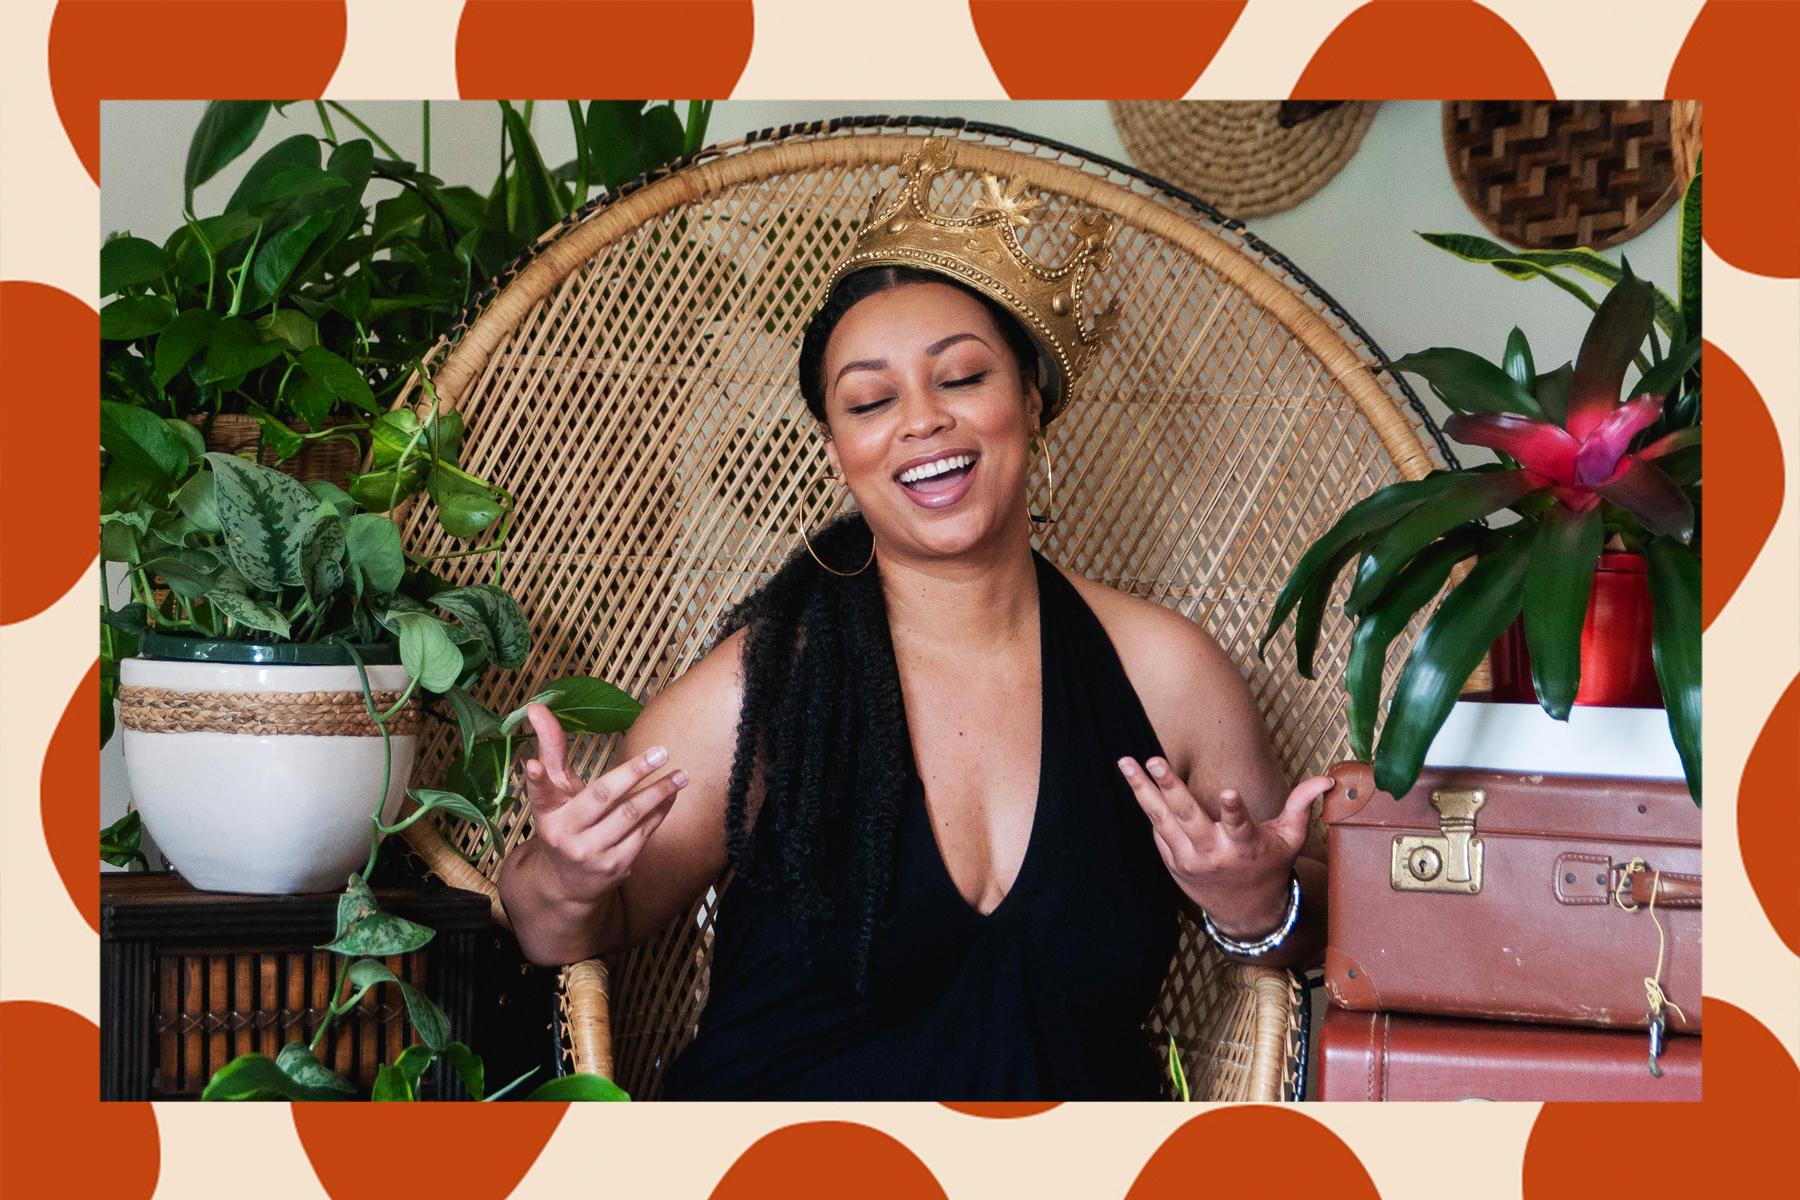 monique Floyd Interview, self-love